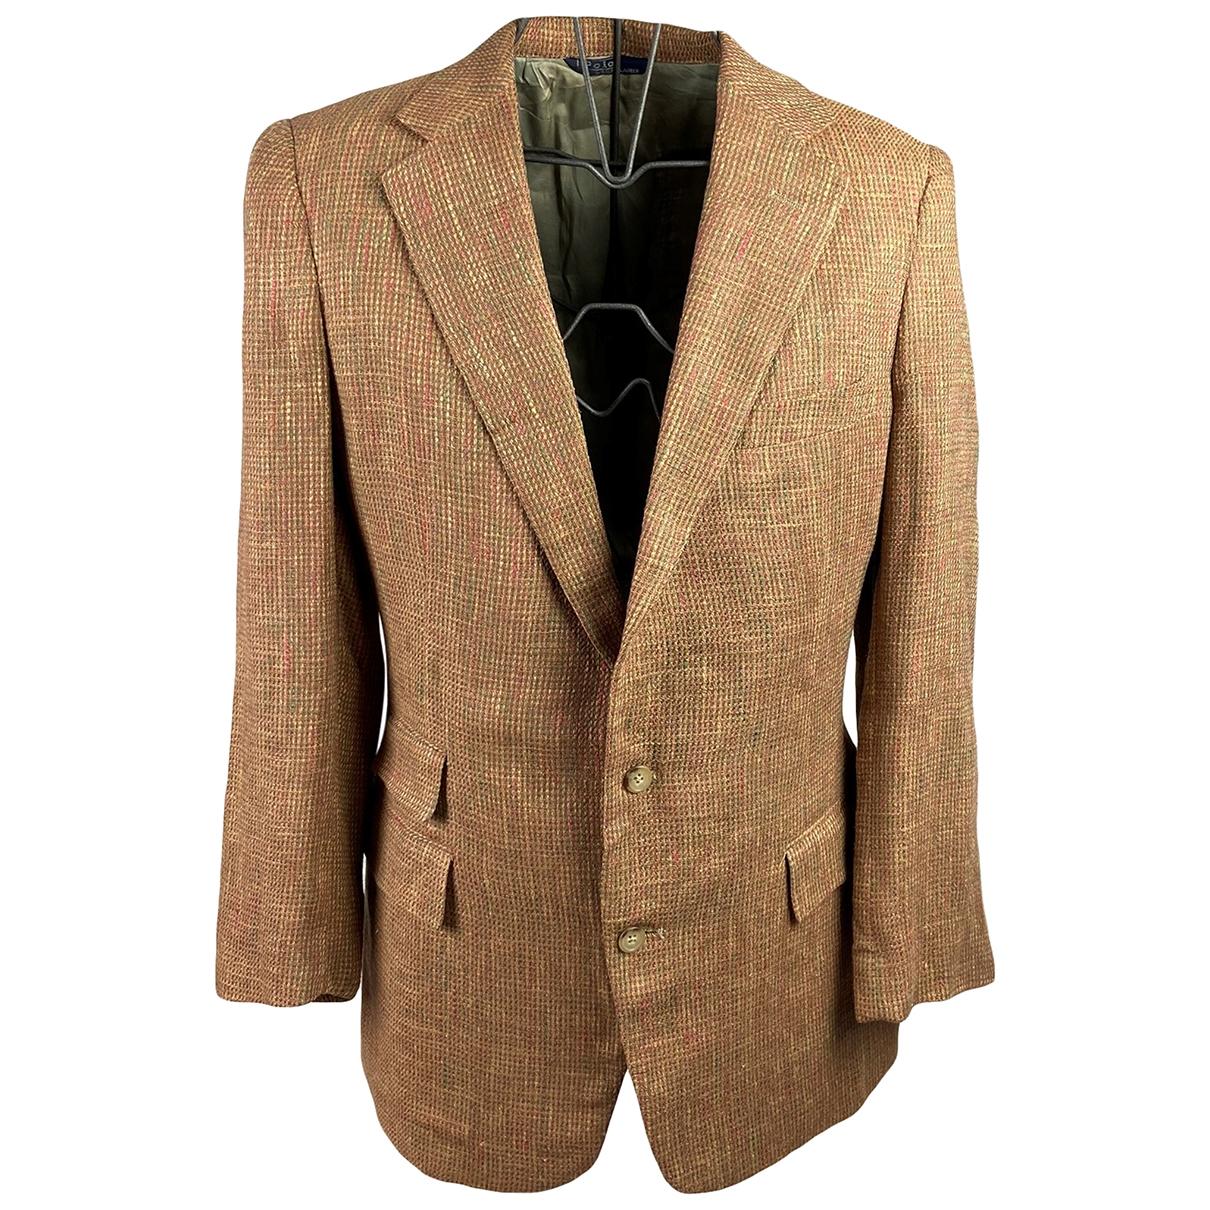 Polo Ralph Lauren \N Brown Linen jacket  for Men L International